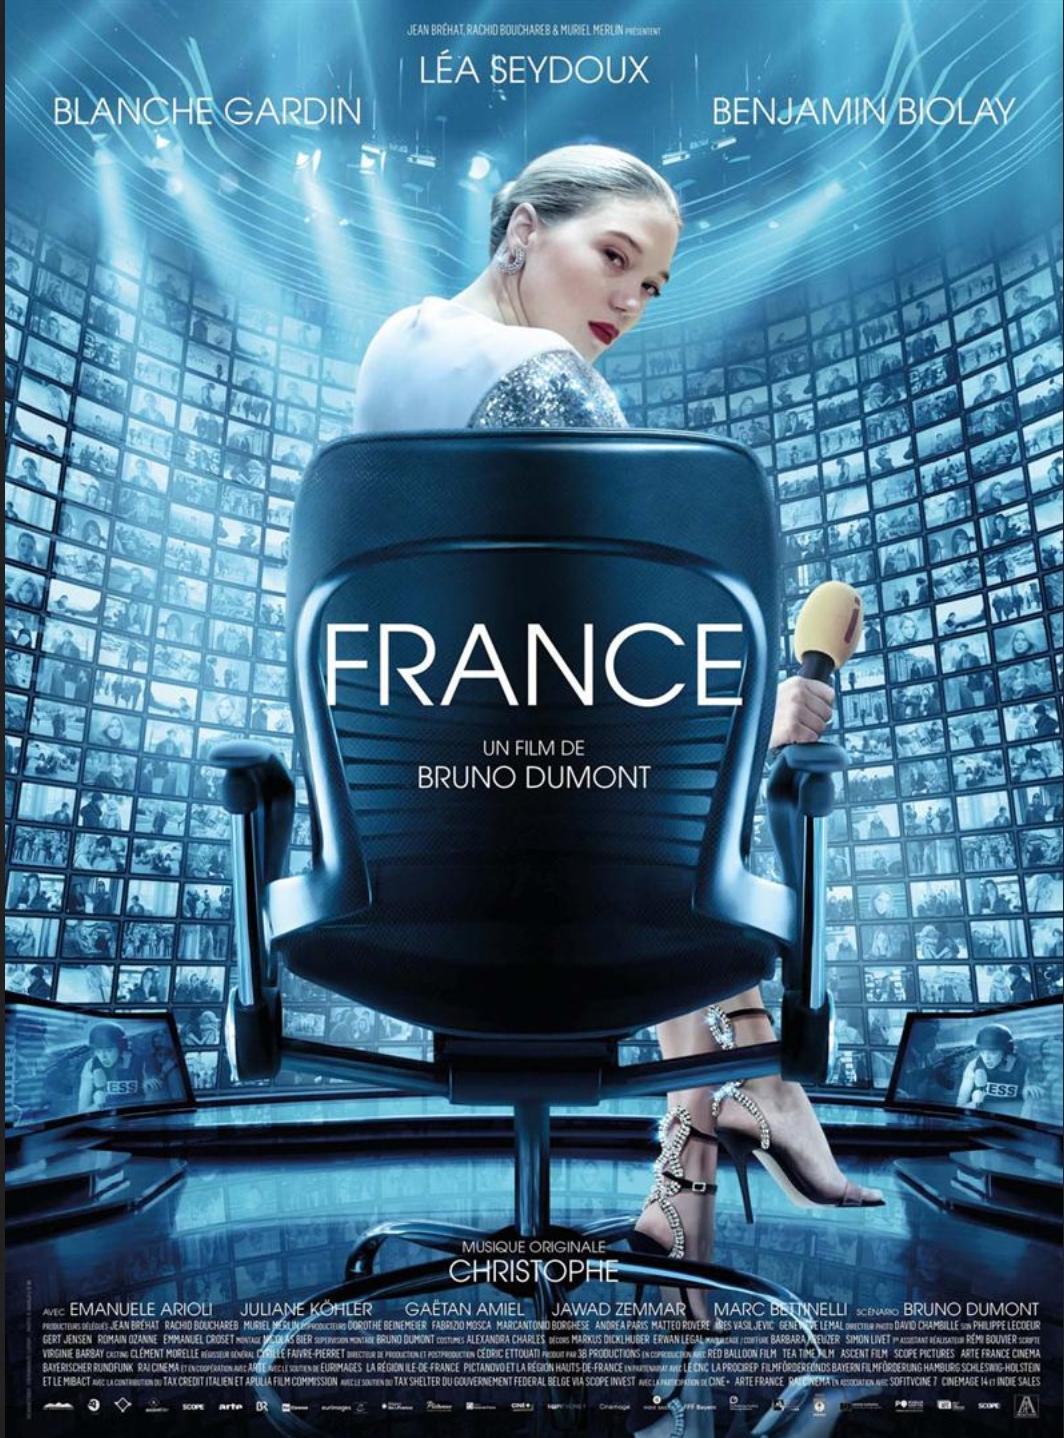 Download Filme France Qualidade Hd